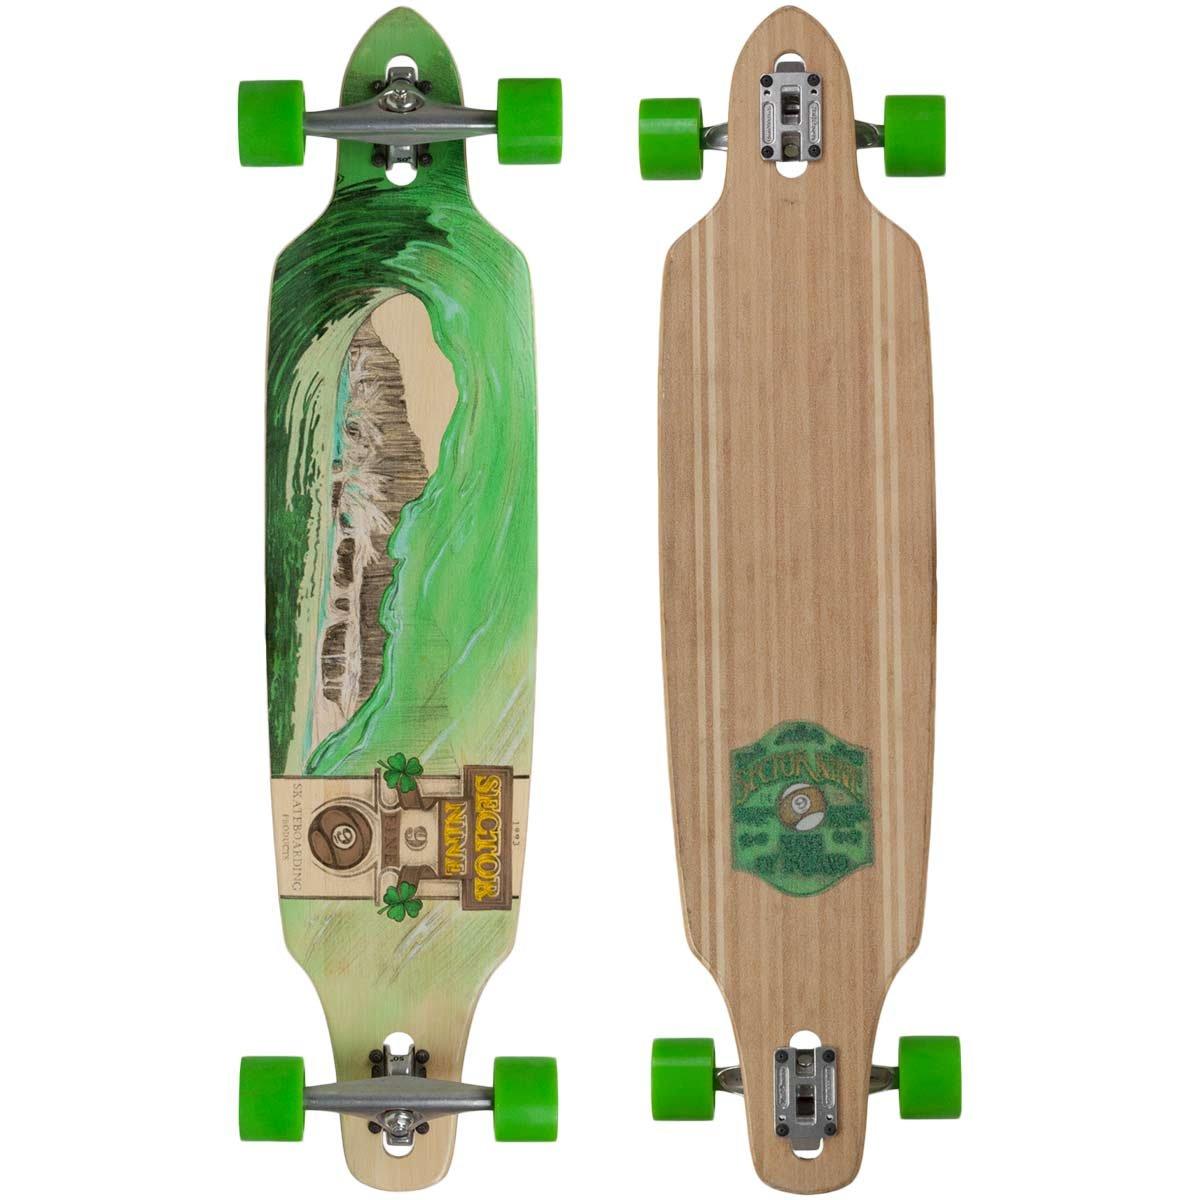 Sector 9 Green Wave Lookout II Drop-Thru Bamboo Complete Downhill Longboard Skateboard - 9.6'' x 42''